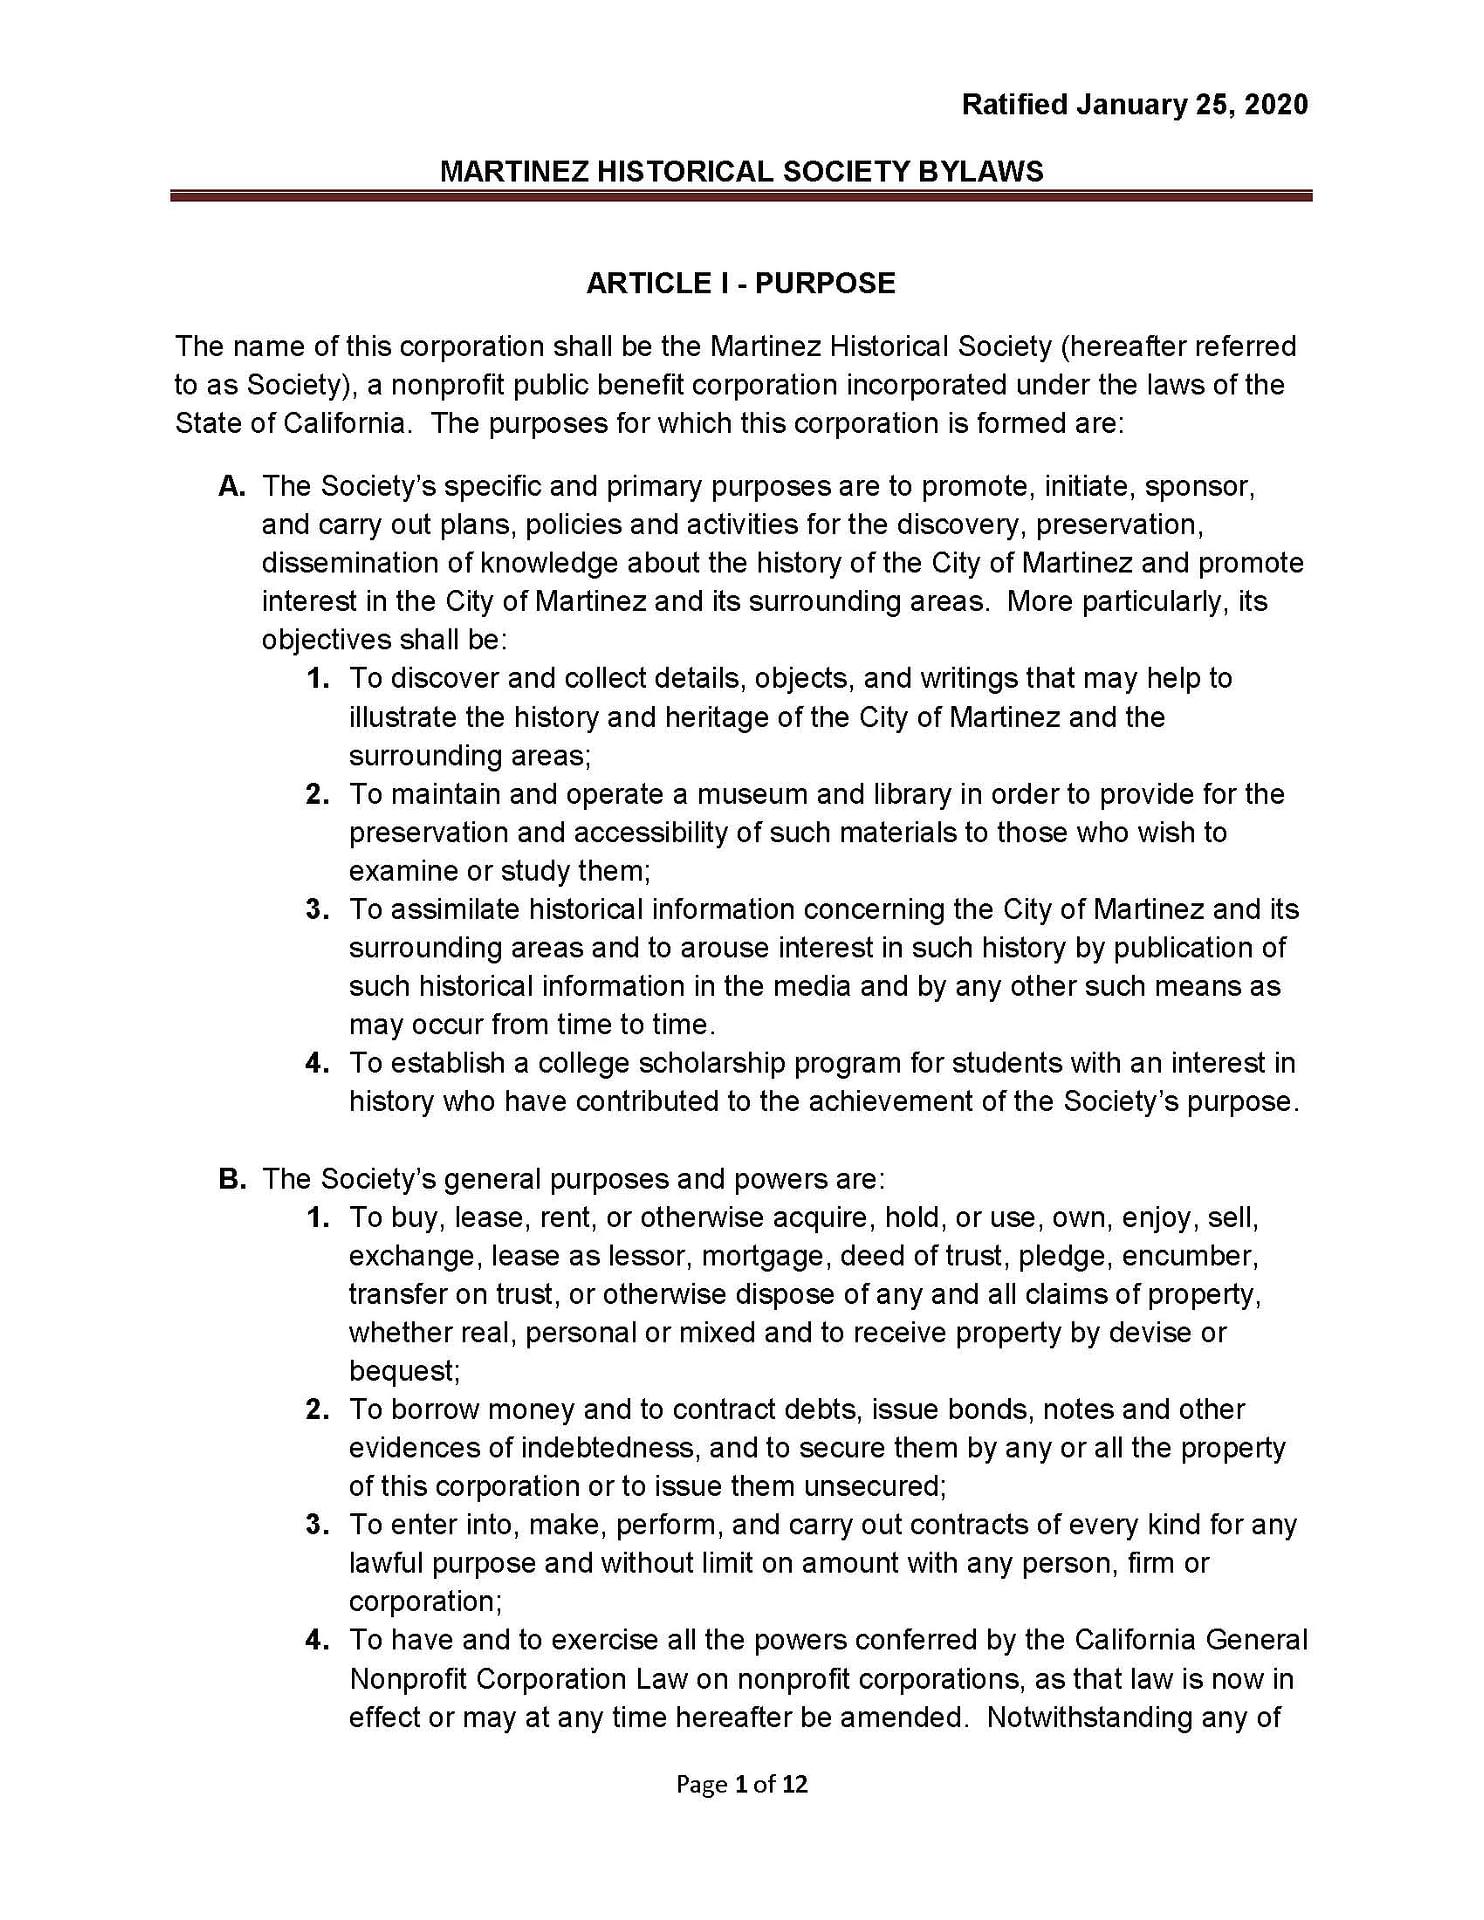 MHS Bylaws Rev 2020-01_Page_01